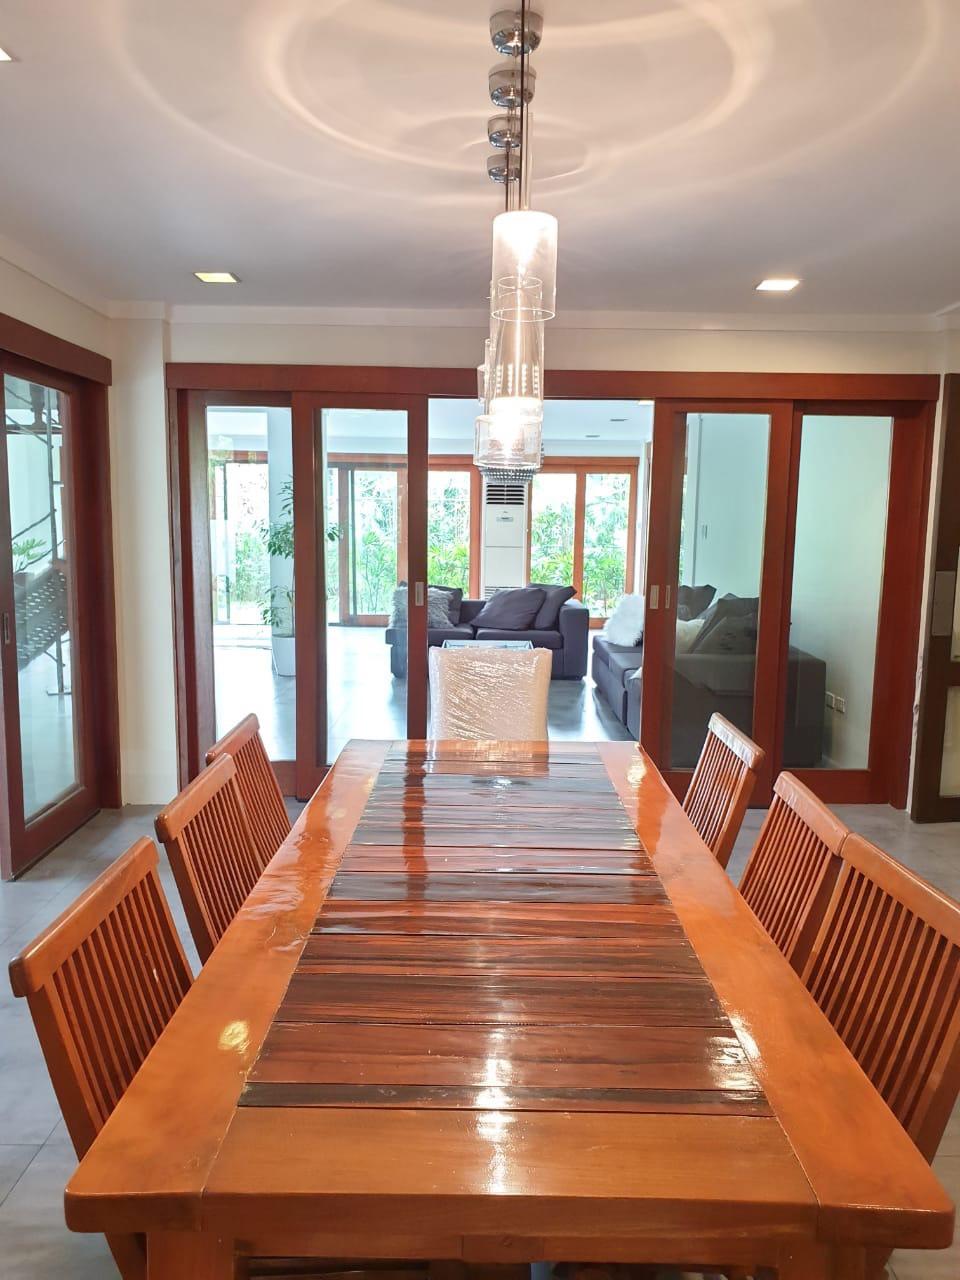 4 Bedrooms House For Sale, Ayala Alabang 9